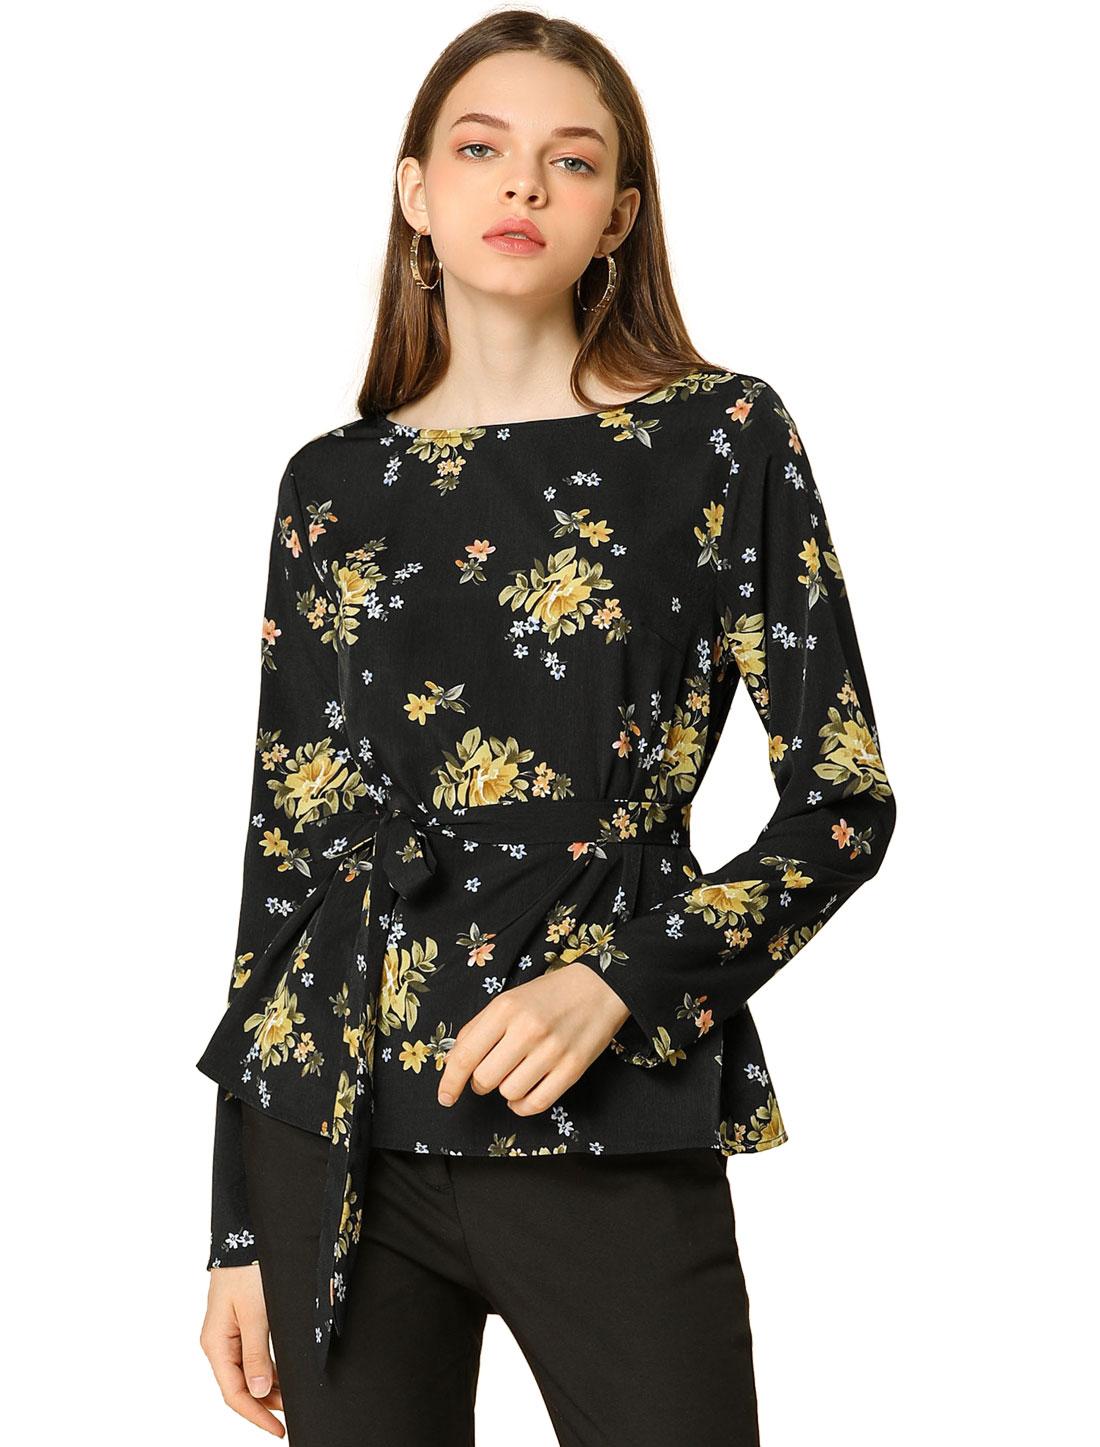 Allegra K Women's Long Sleeve Waist Belt Loose Floral Blouse Black M